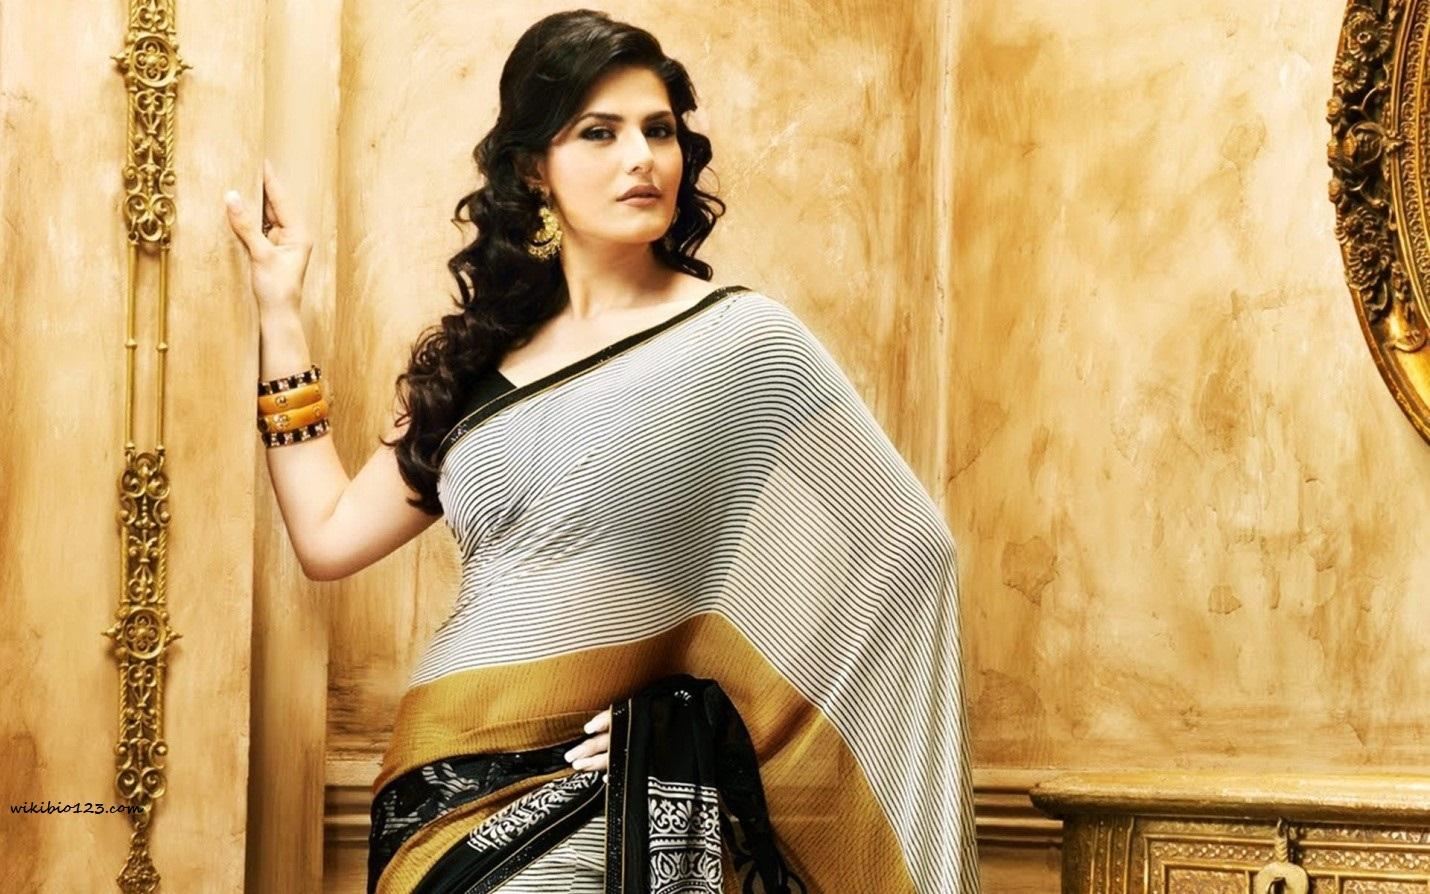 Zareen Khan Wiki Bio Age Figure Size Height Hobbies Friends HD Images Wallpapers